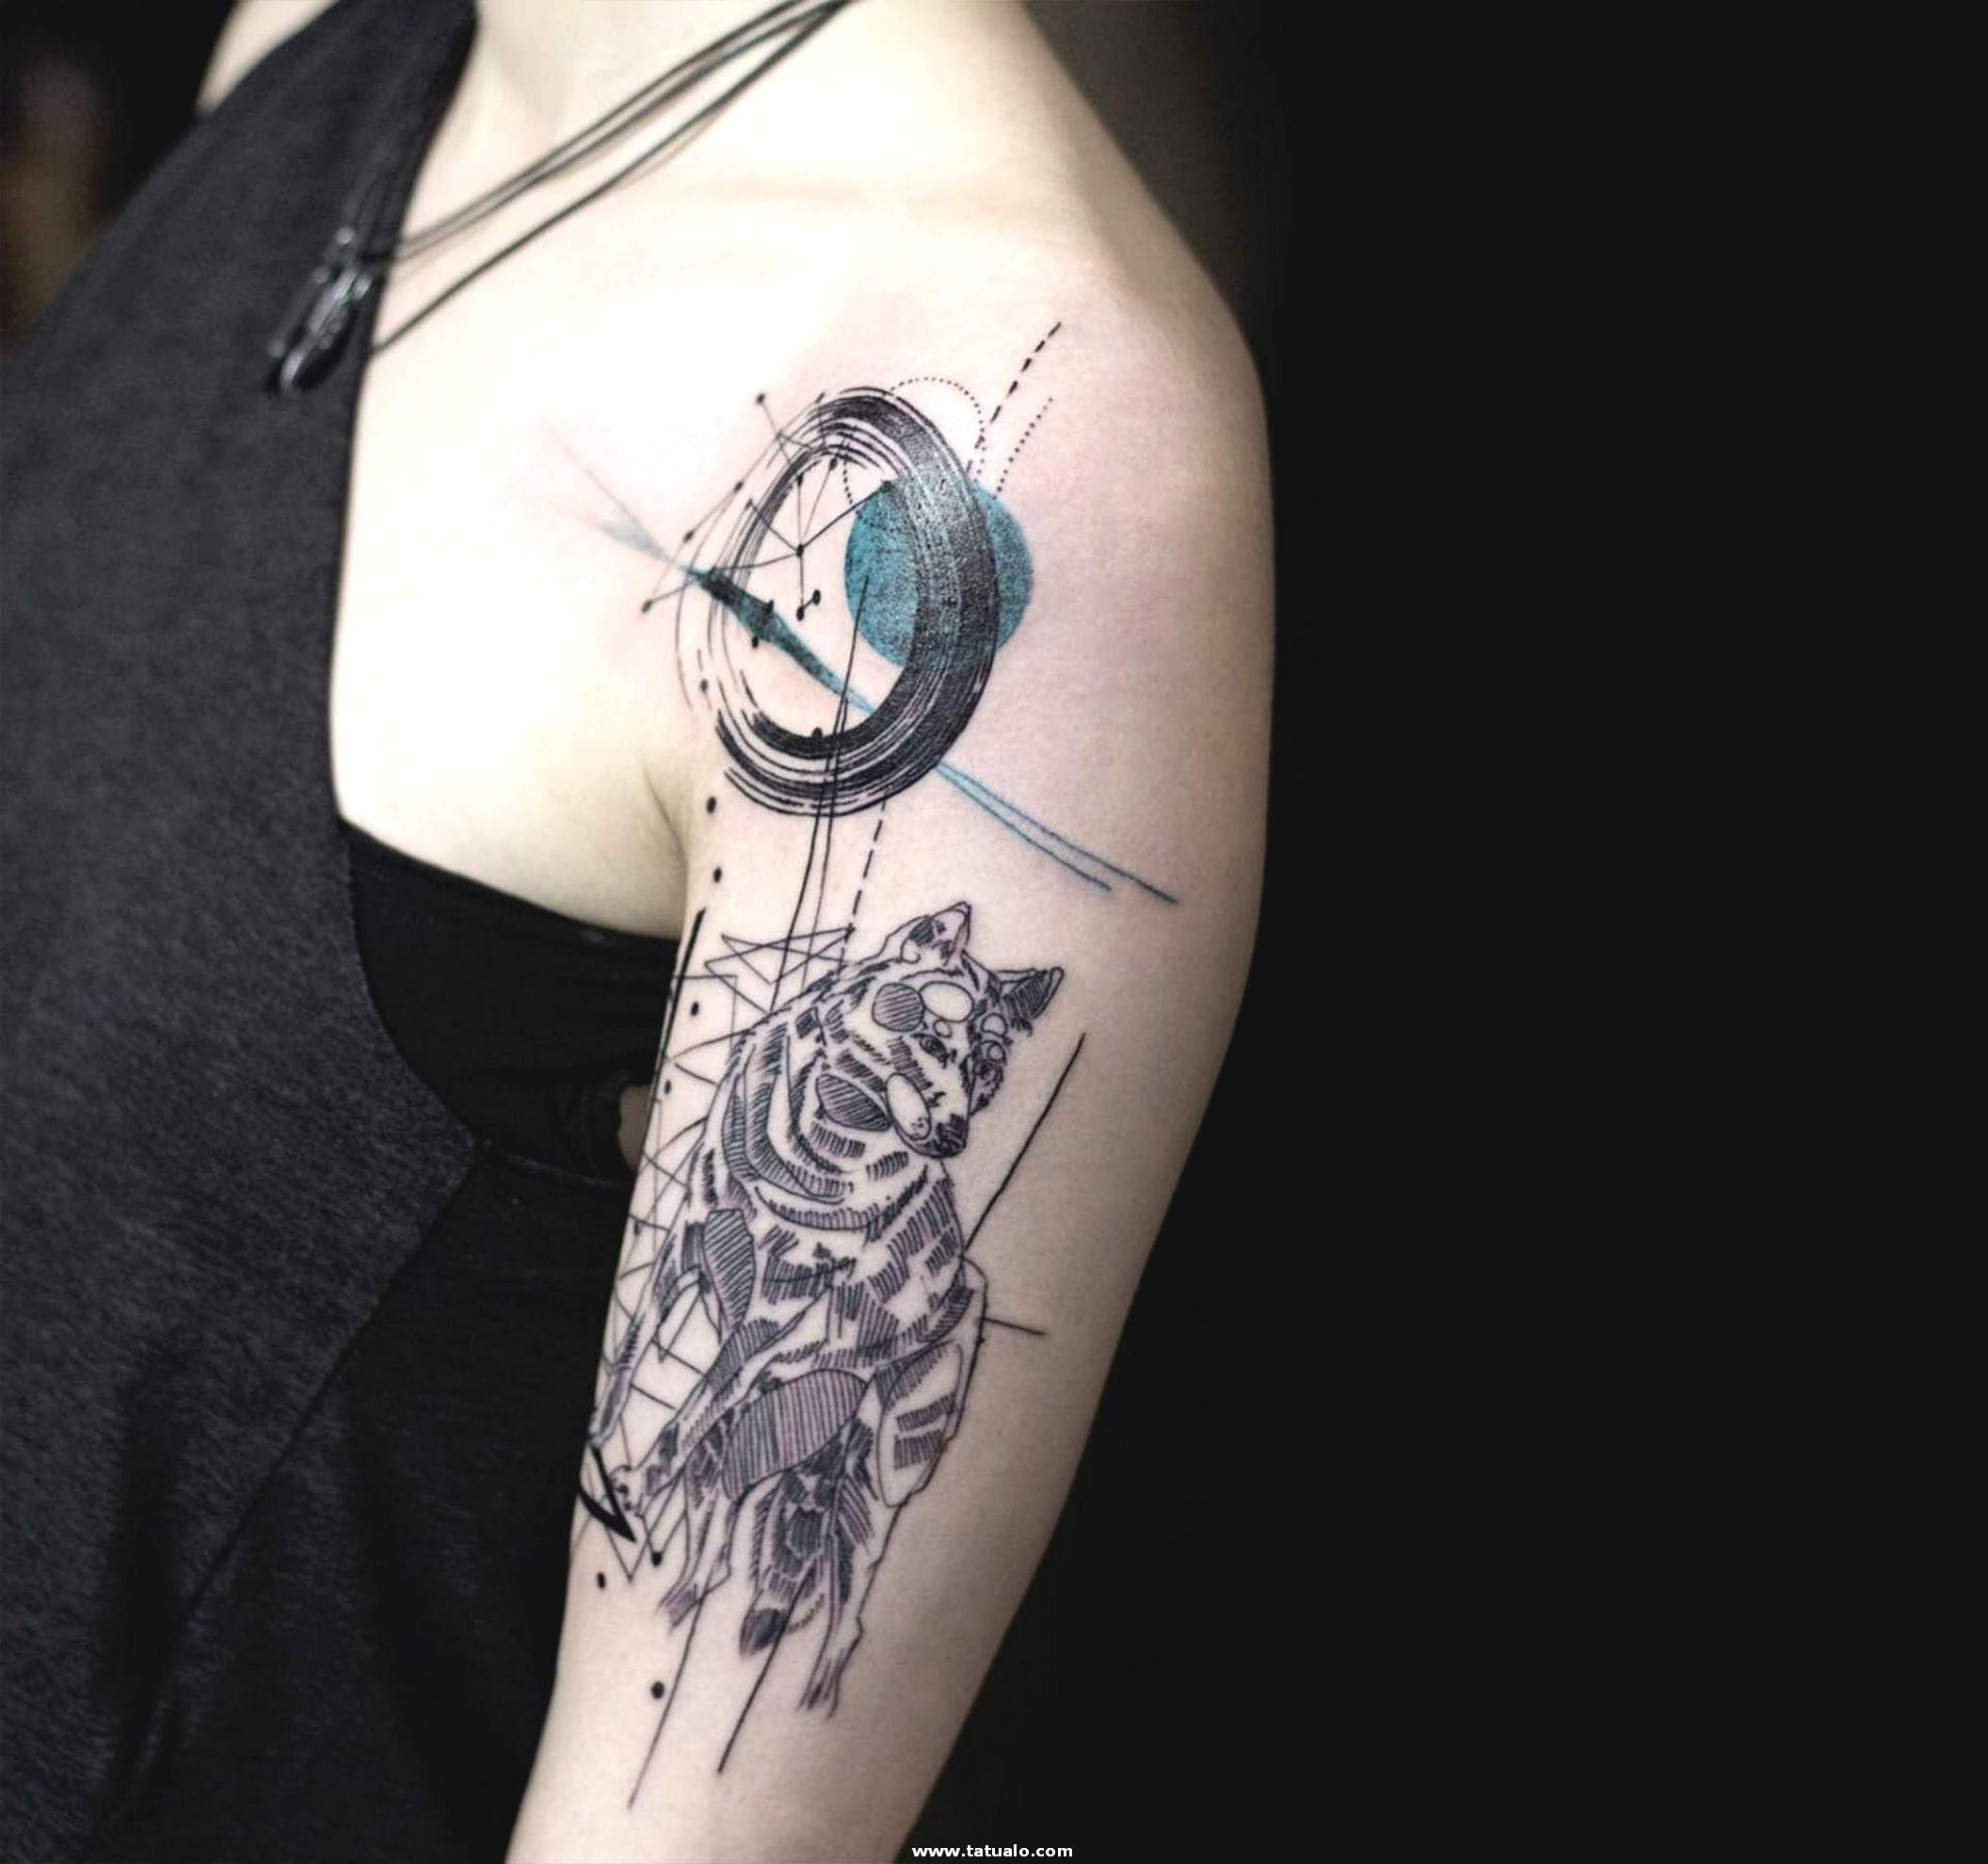 Tatuajes Para Mujeres En El Brazo 23few